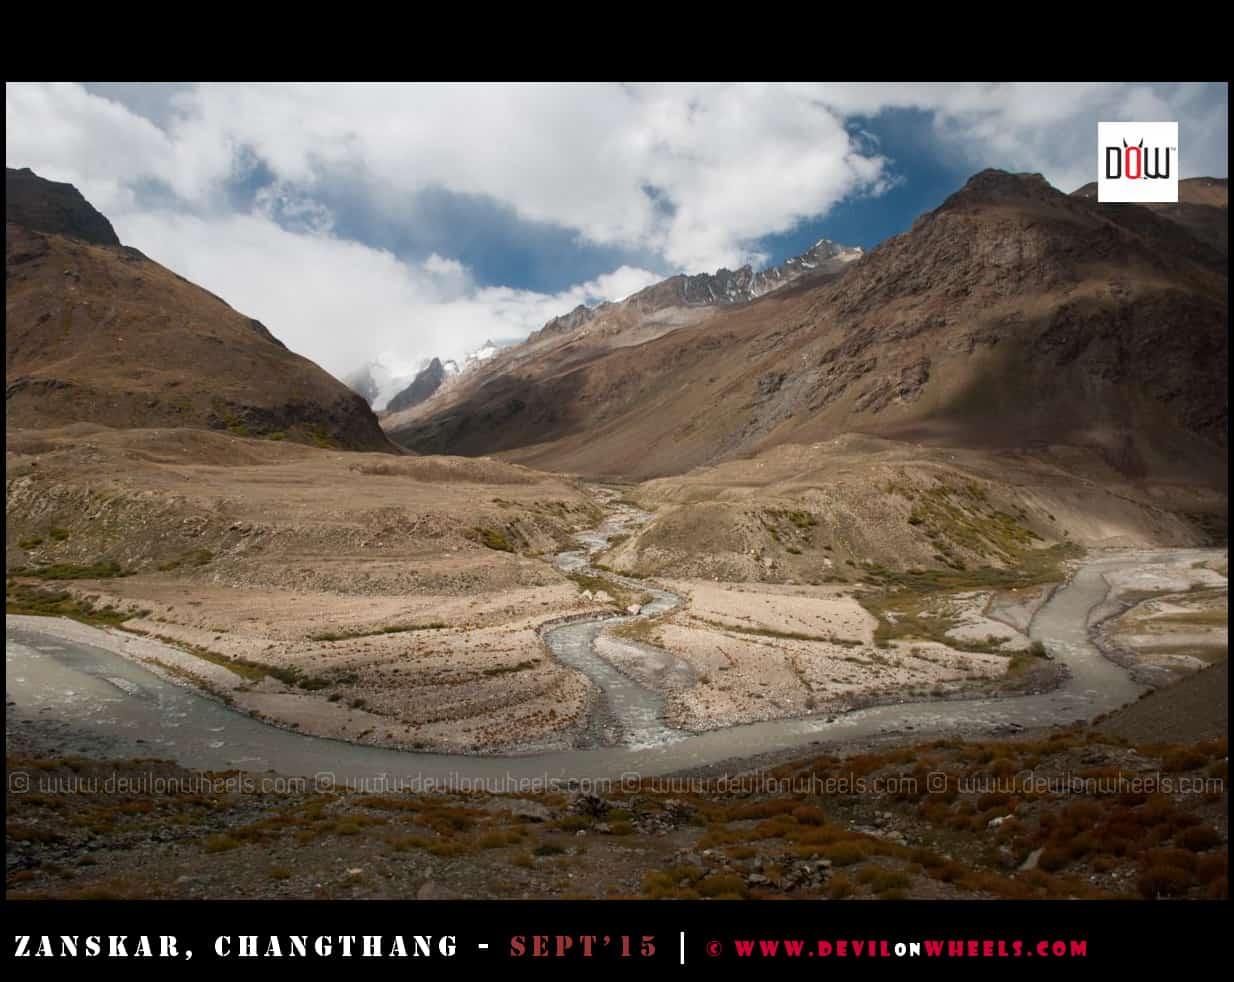 And it meets into Zanskar river